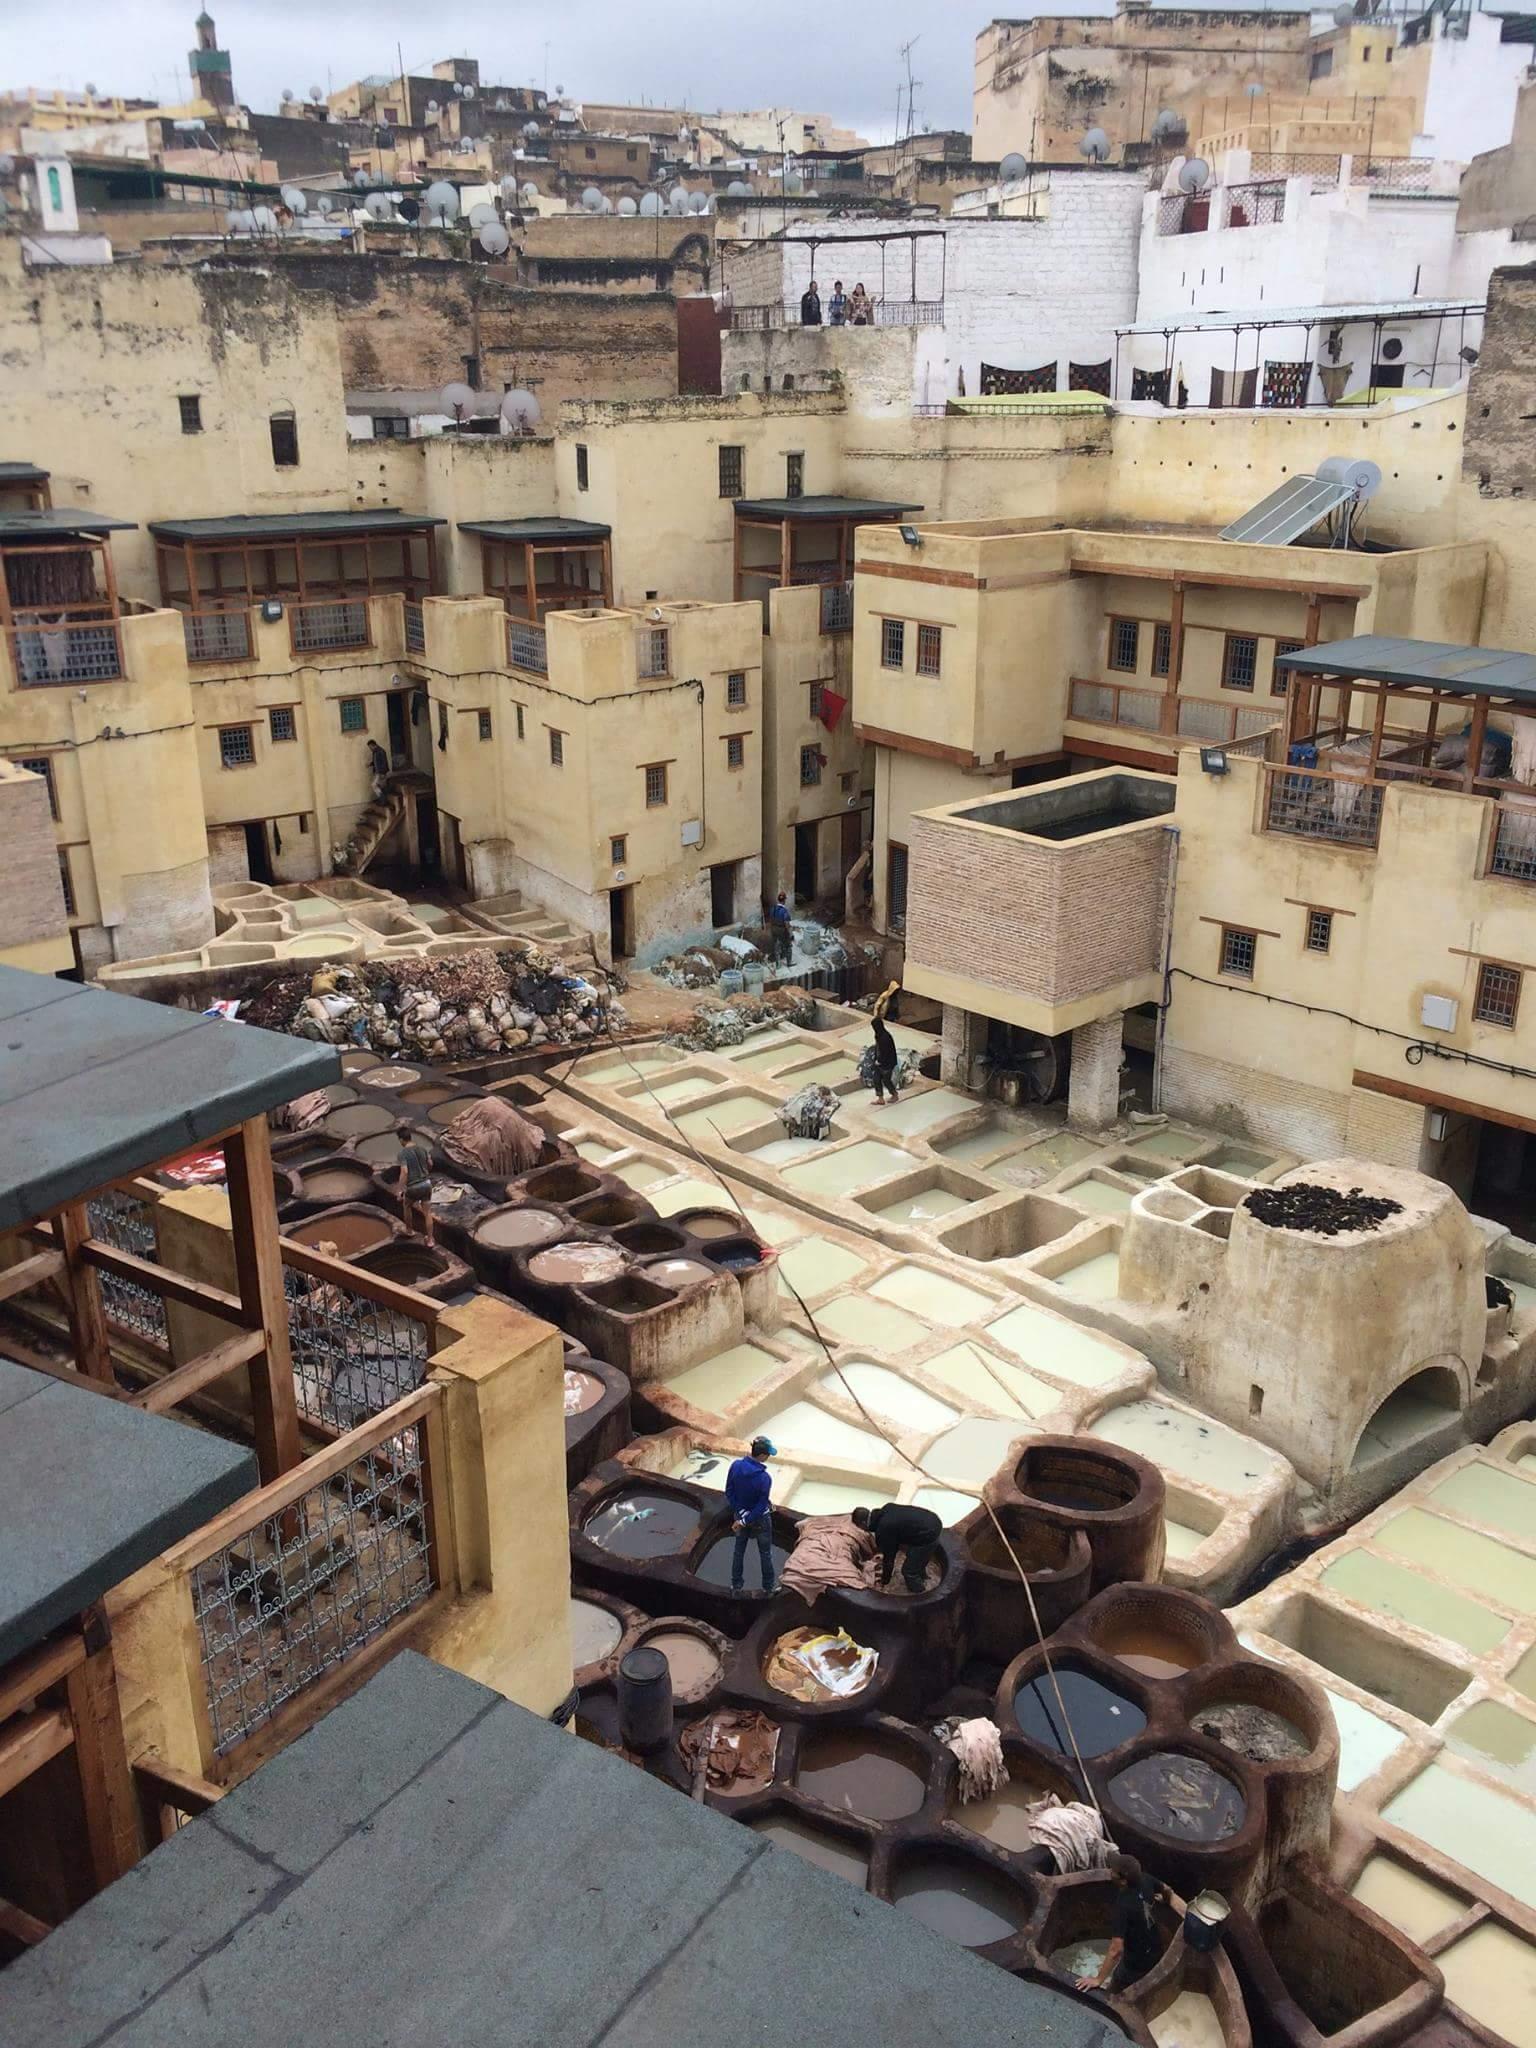 http://moroccotourtravel.com/wp-content/uploads/2016/10/FB_IMG_1465137964914.jpg